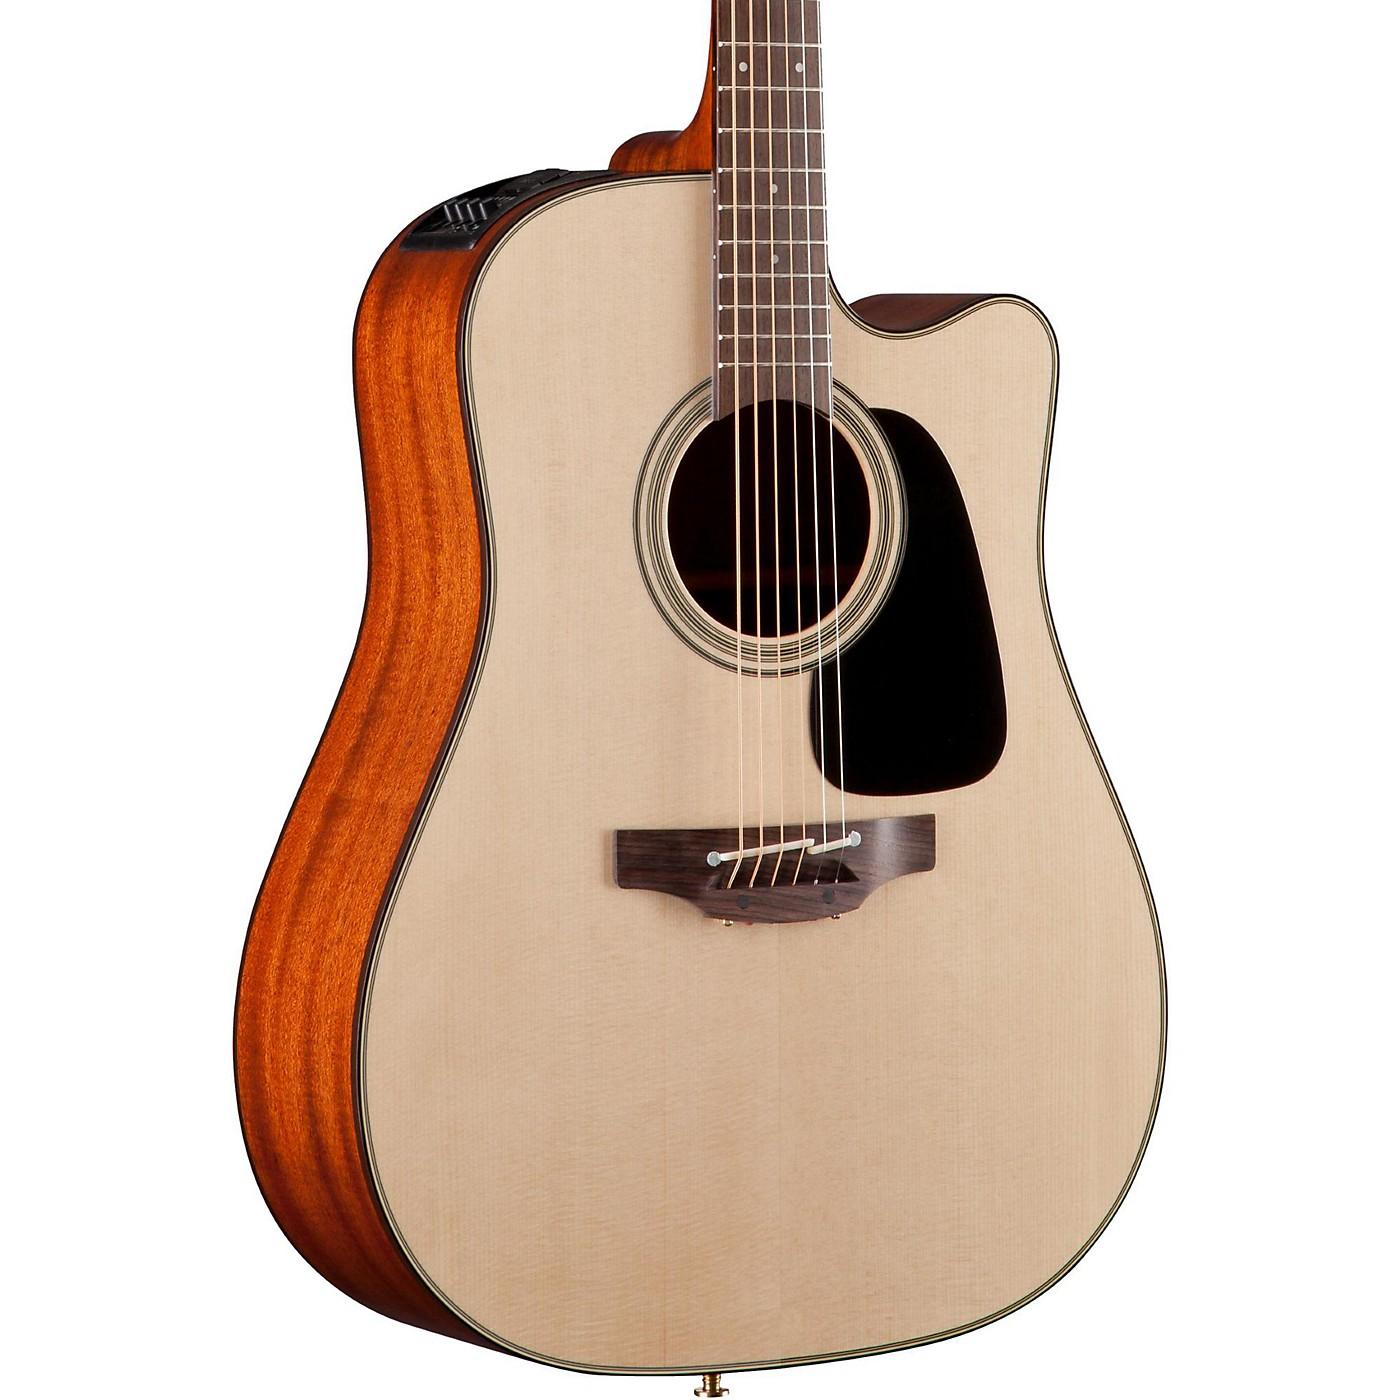 Takamine Pro Series 2 Dreadnought Cutaway Acoustic-Electric Guitar thumbnail